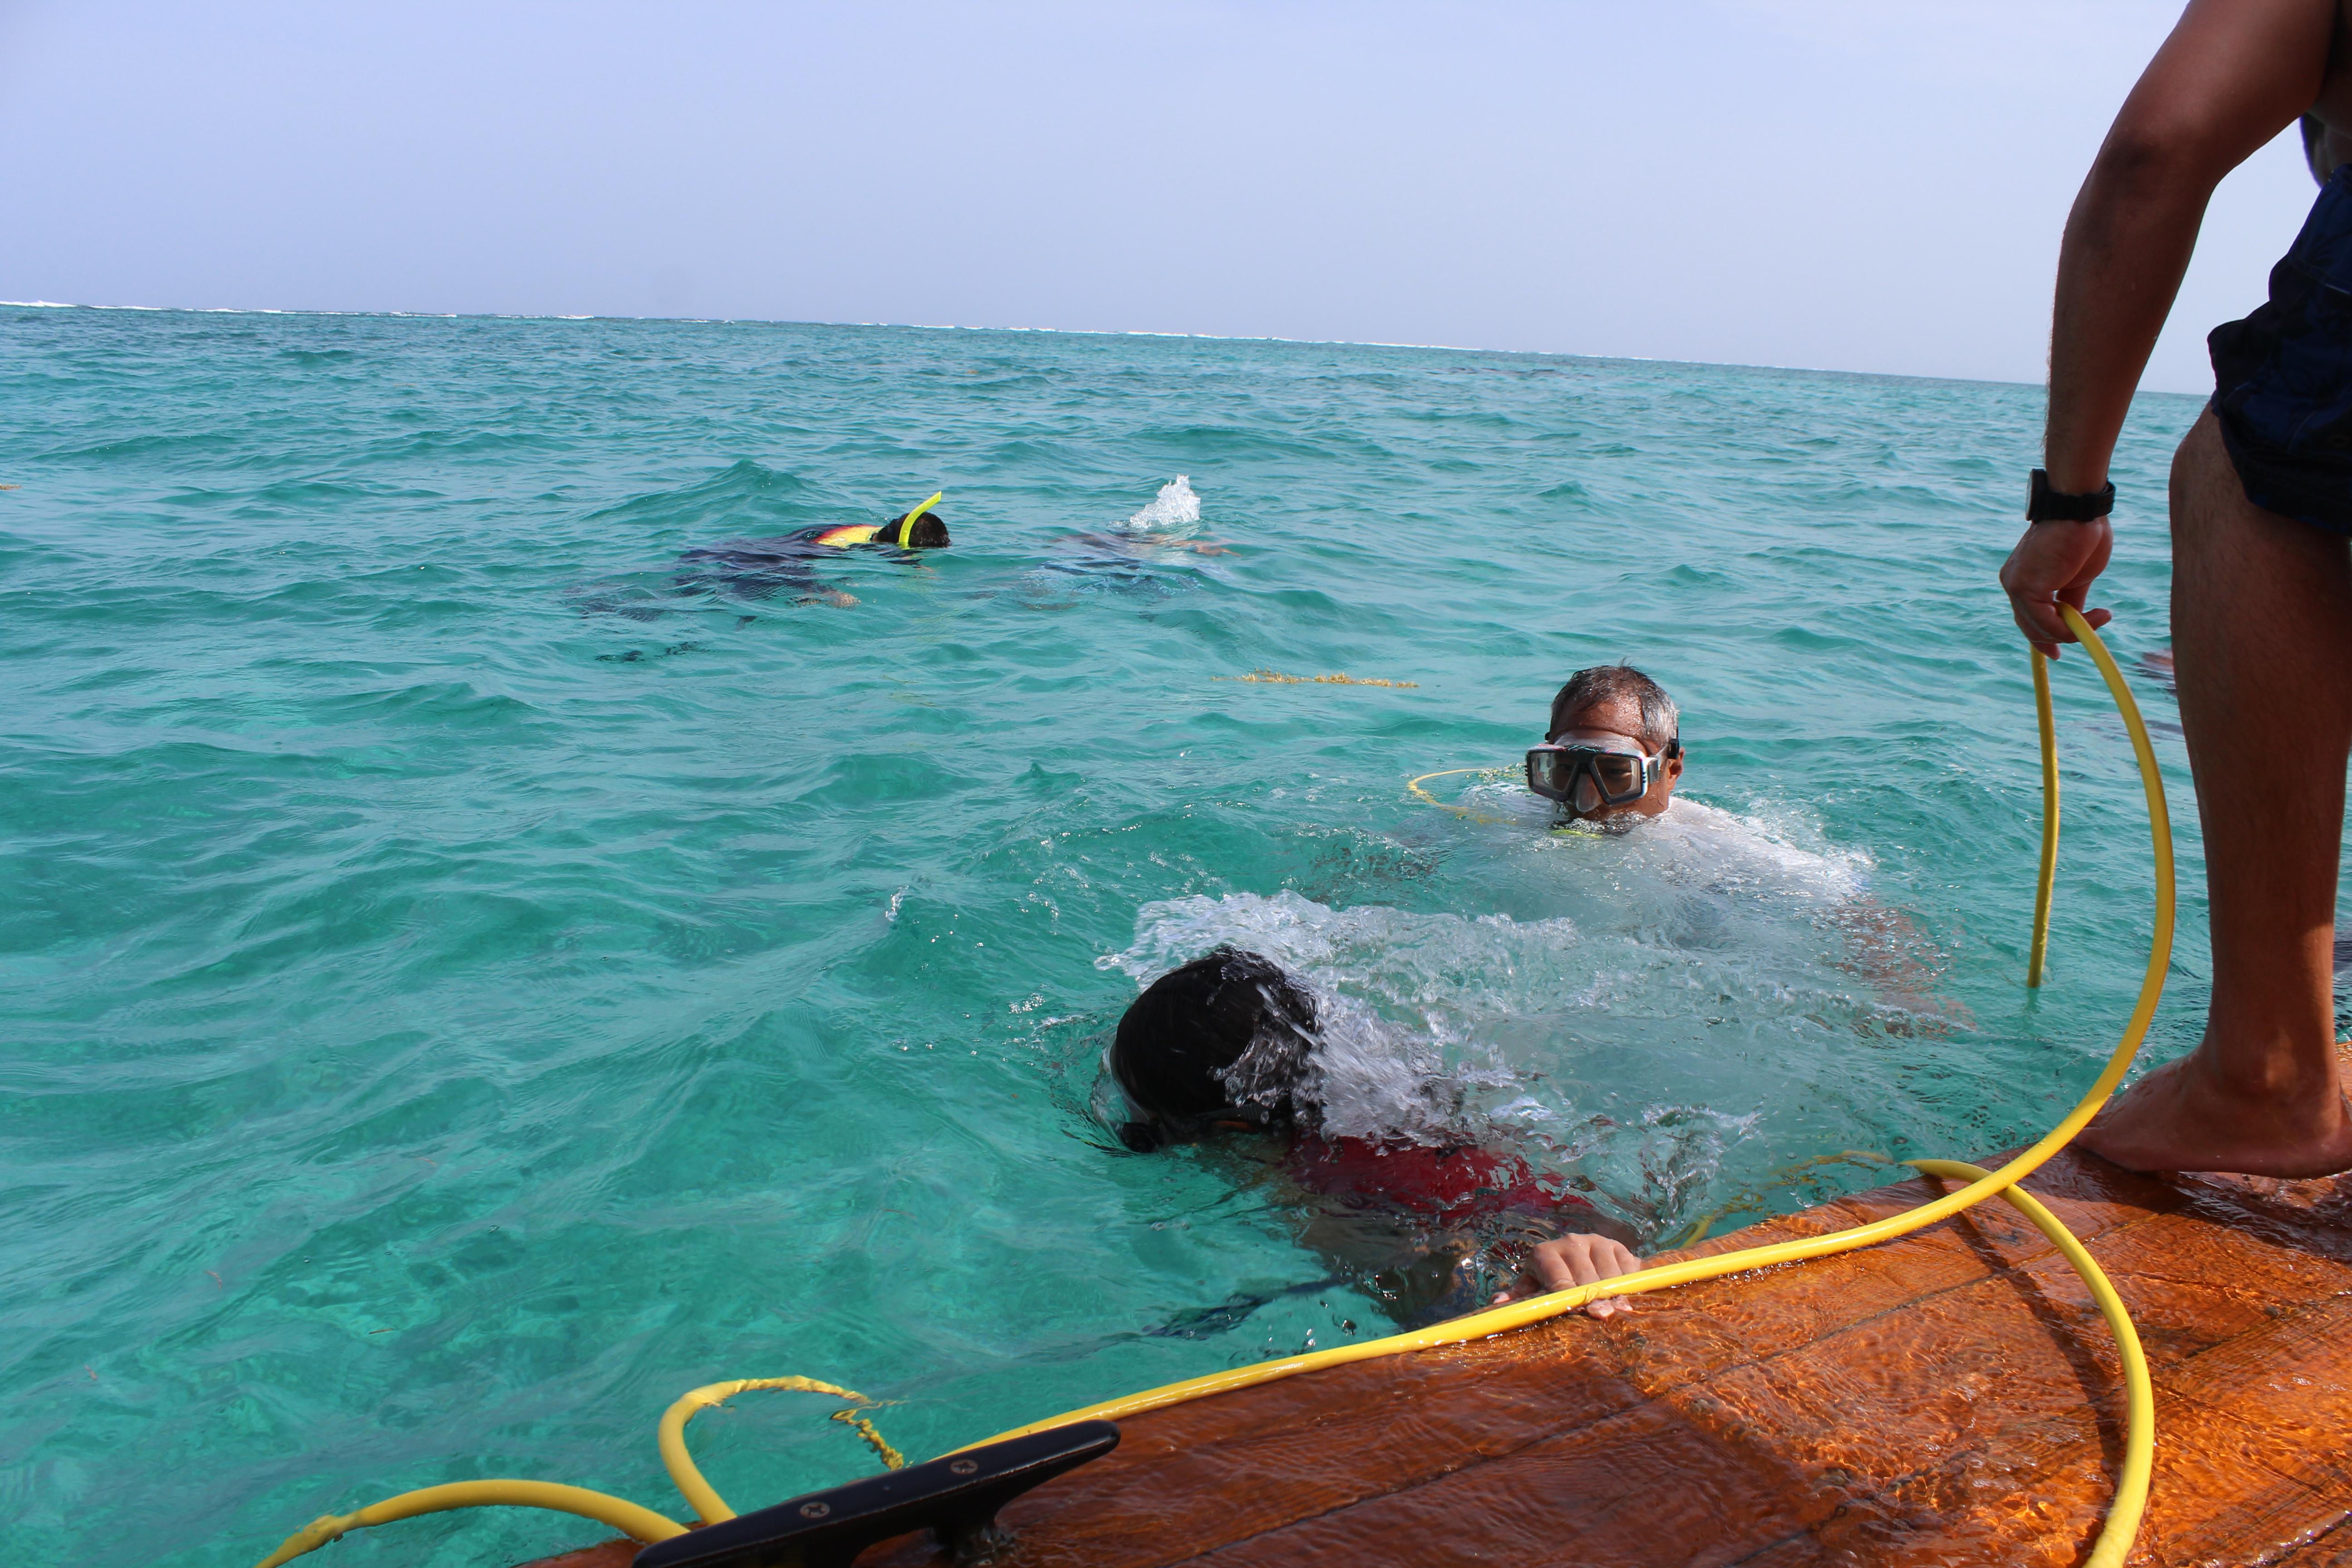 Canary Cove Snuba Fun from the Swim Platform at Mexico Rocks